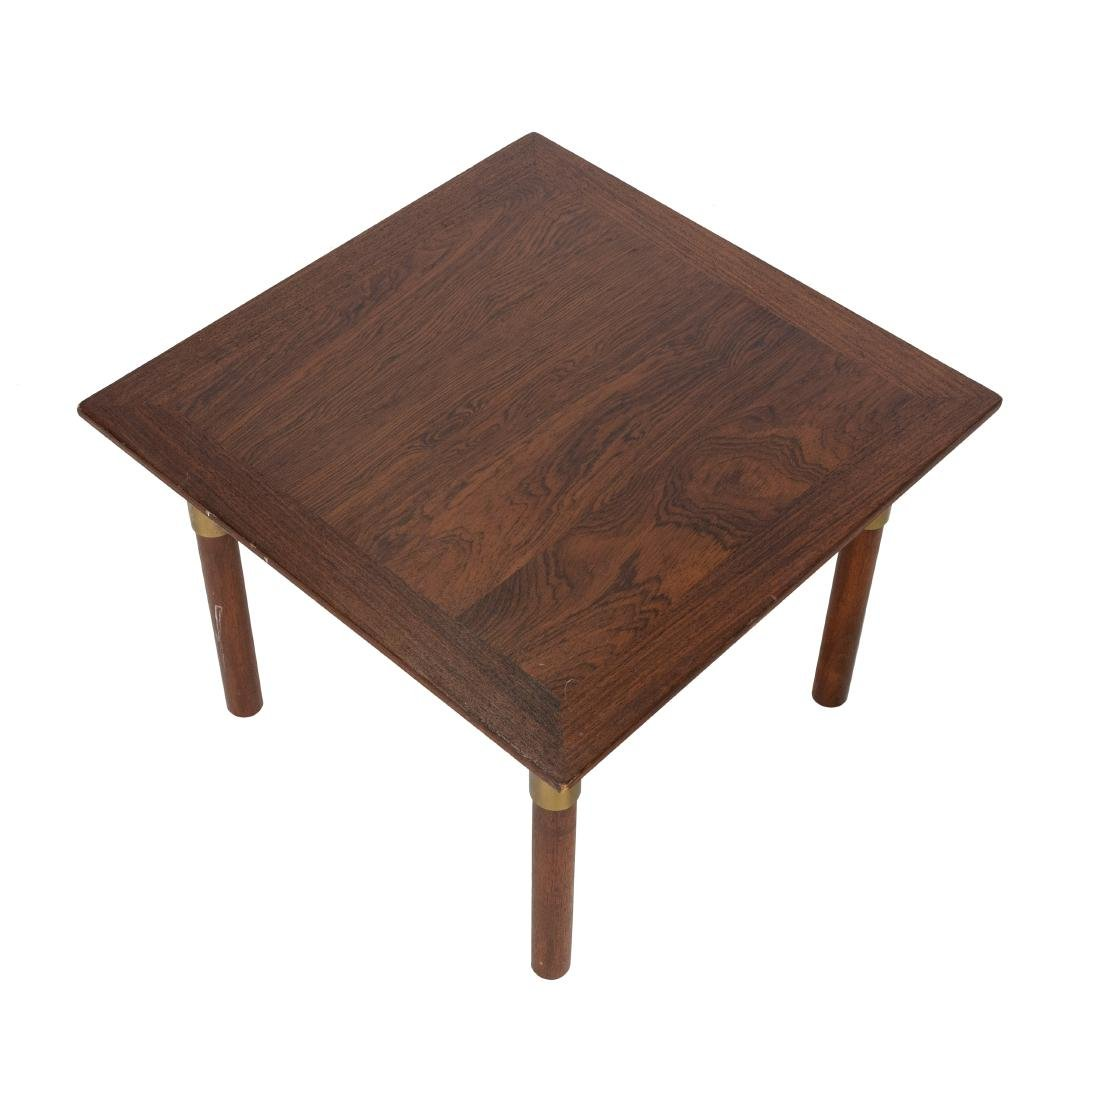 Bert England - Rosewood End Tables - 2